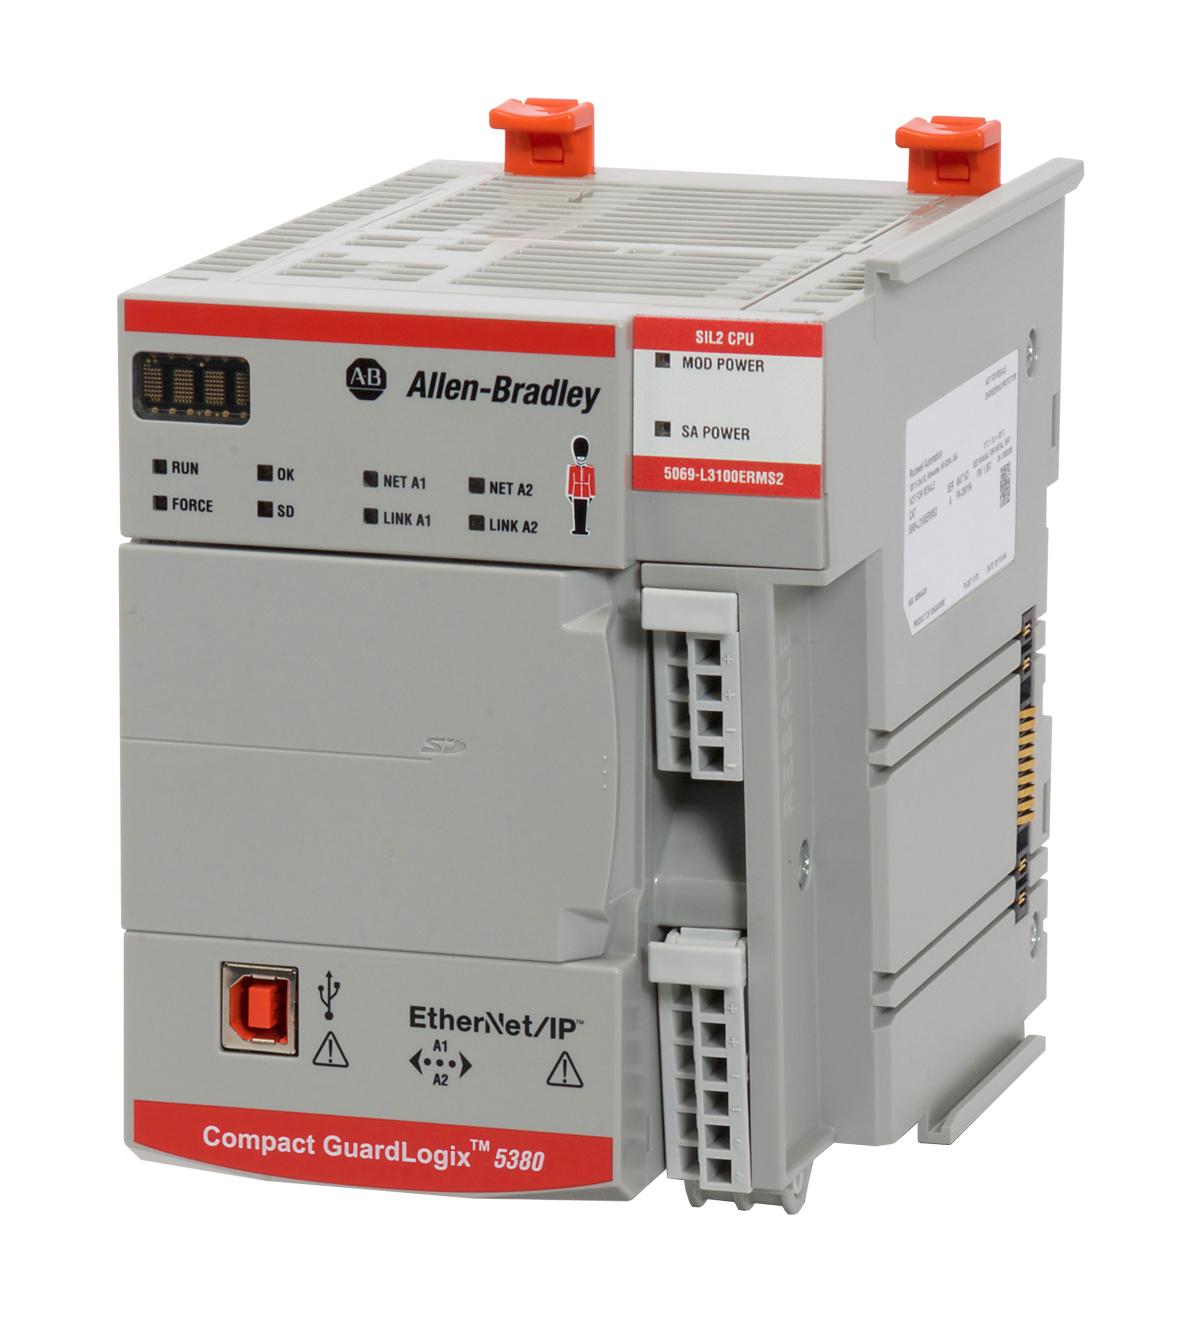 контроллеры Allen-Bradley GuardLogix 5580 и Compact GuardLogix 5380